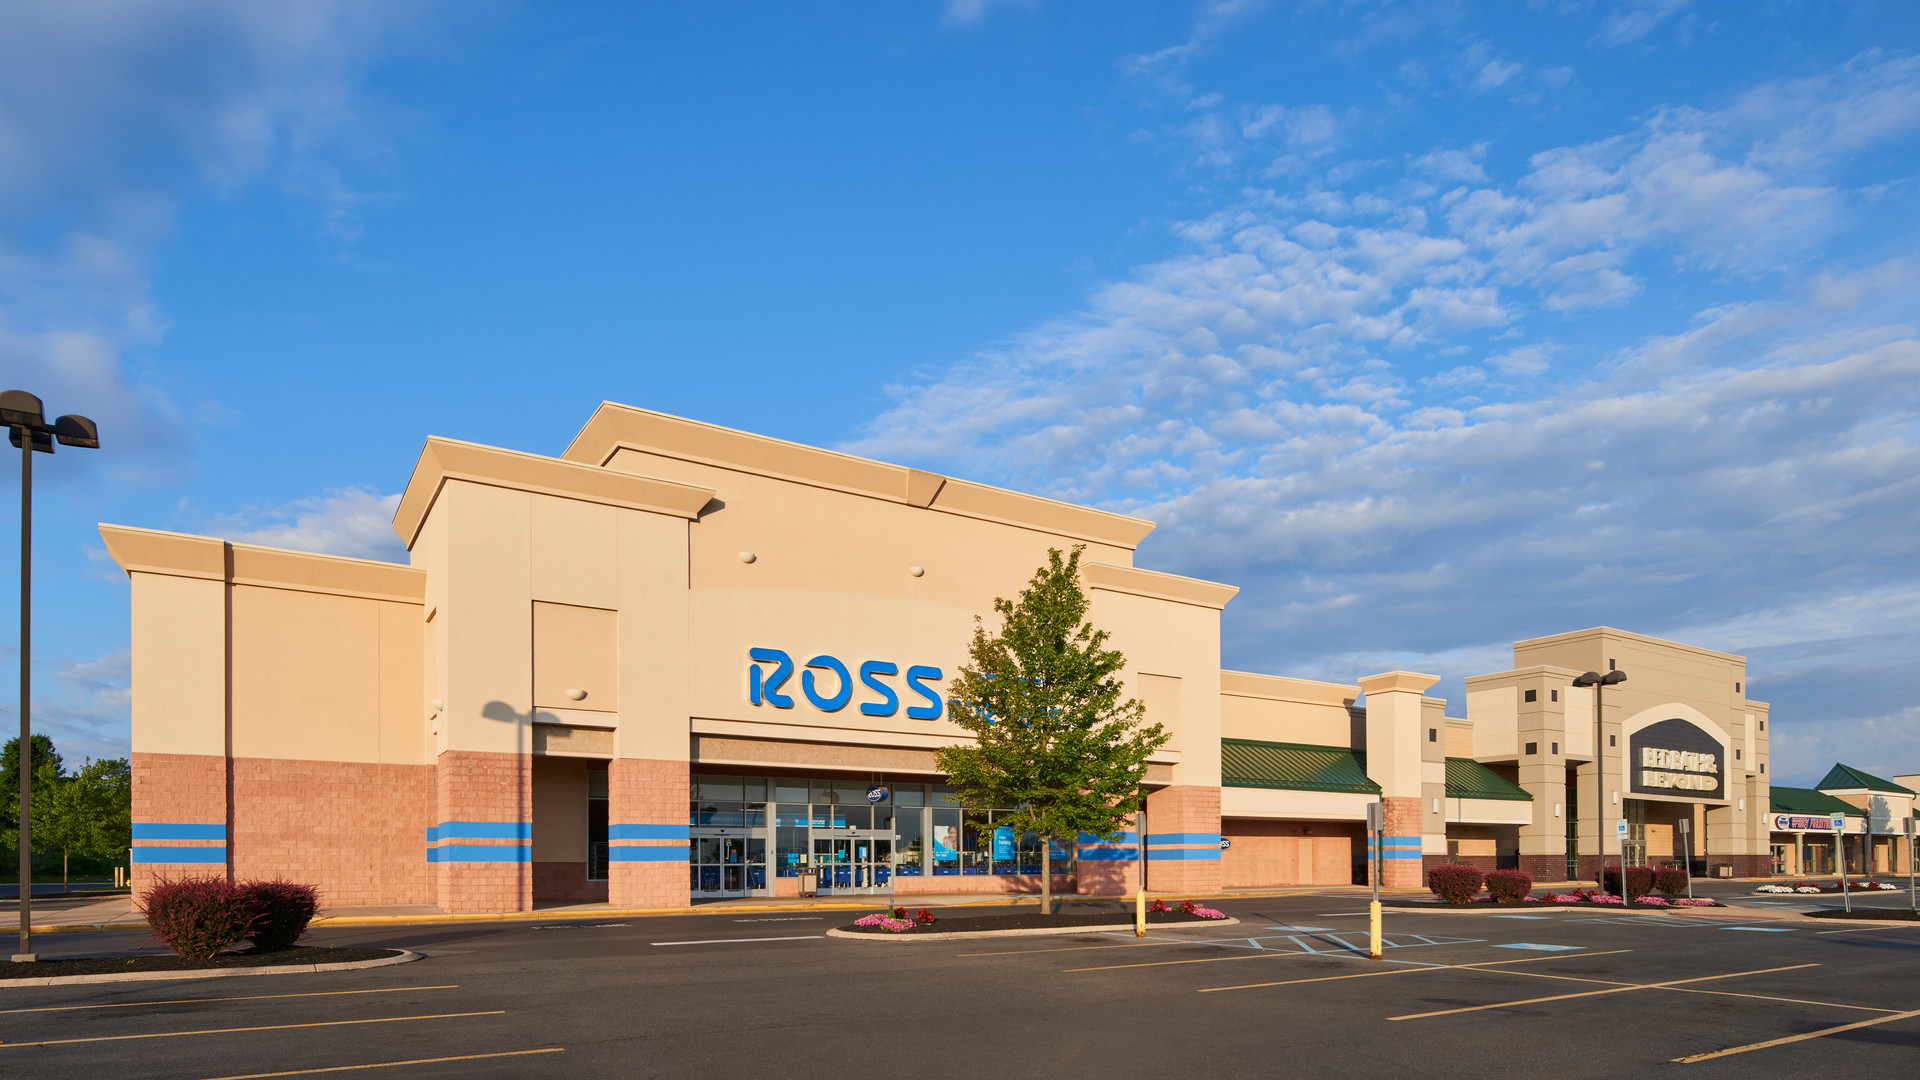 Benner Pike Shops - Ross 2.jpg